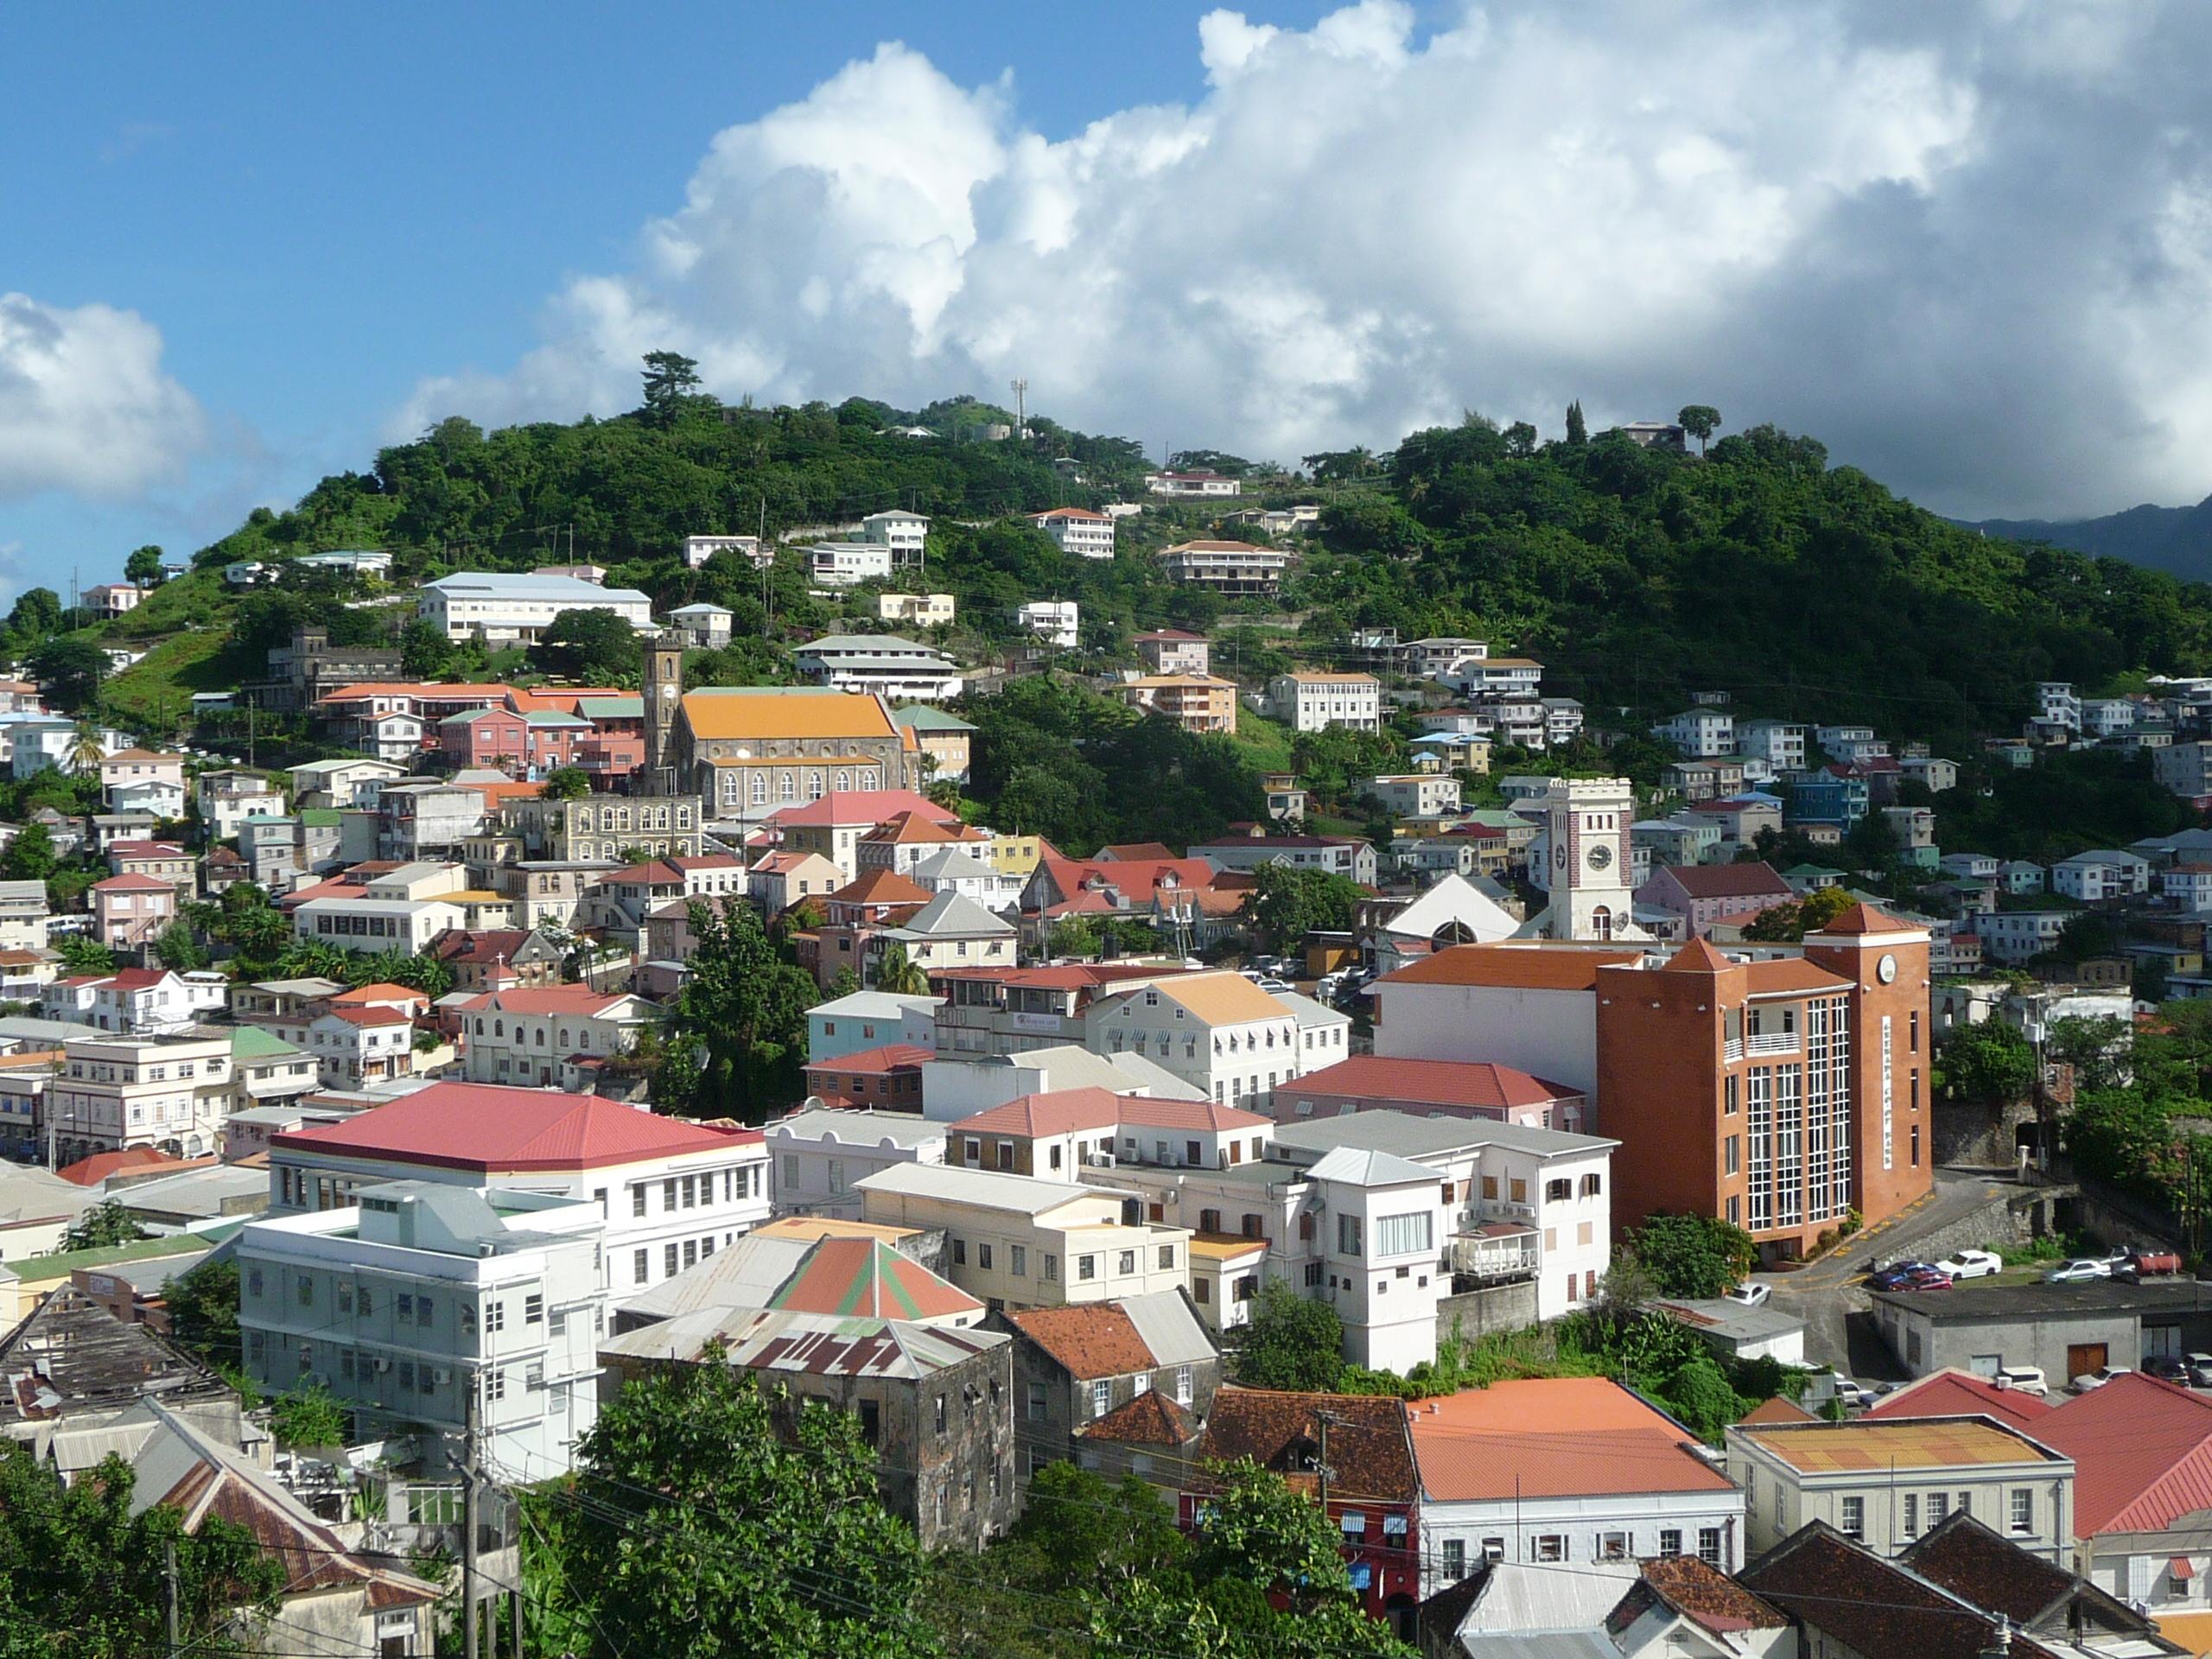 St.George's - Grenada